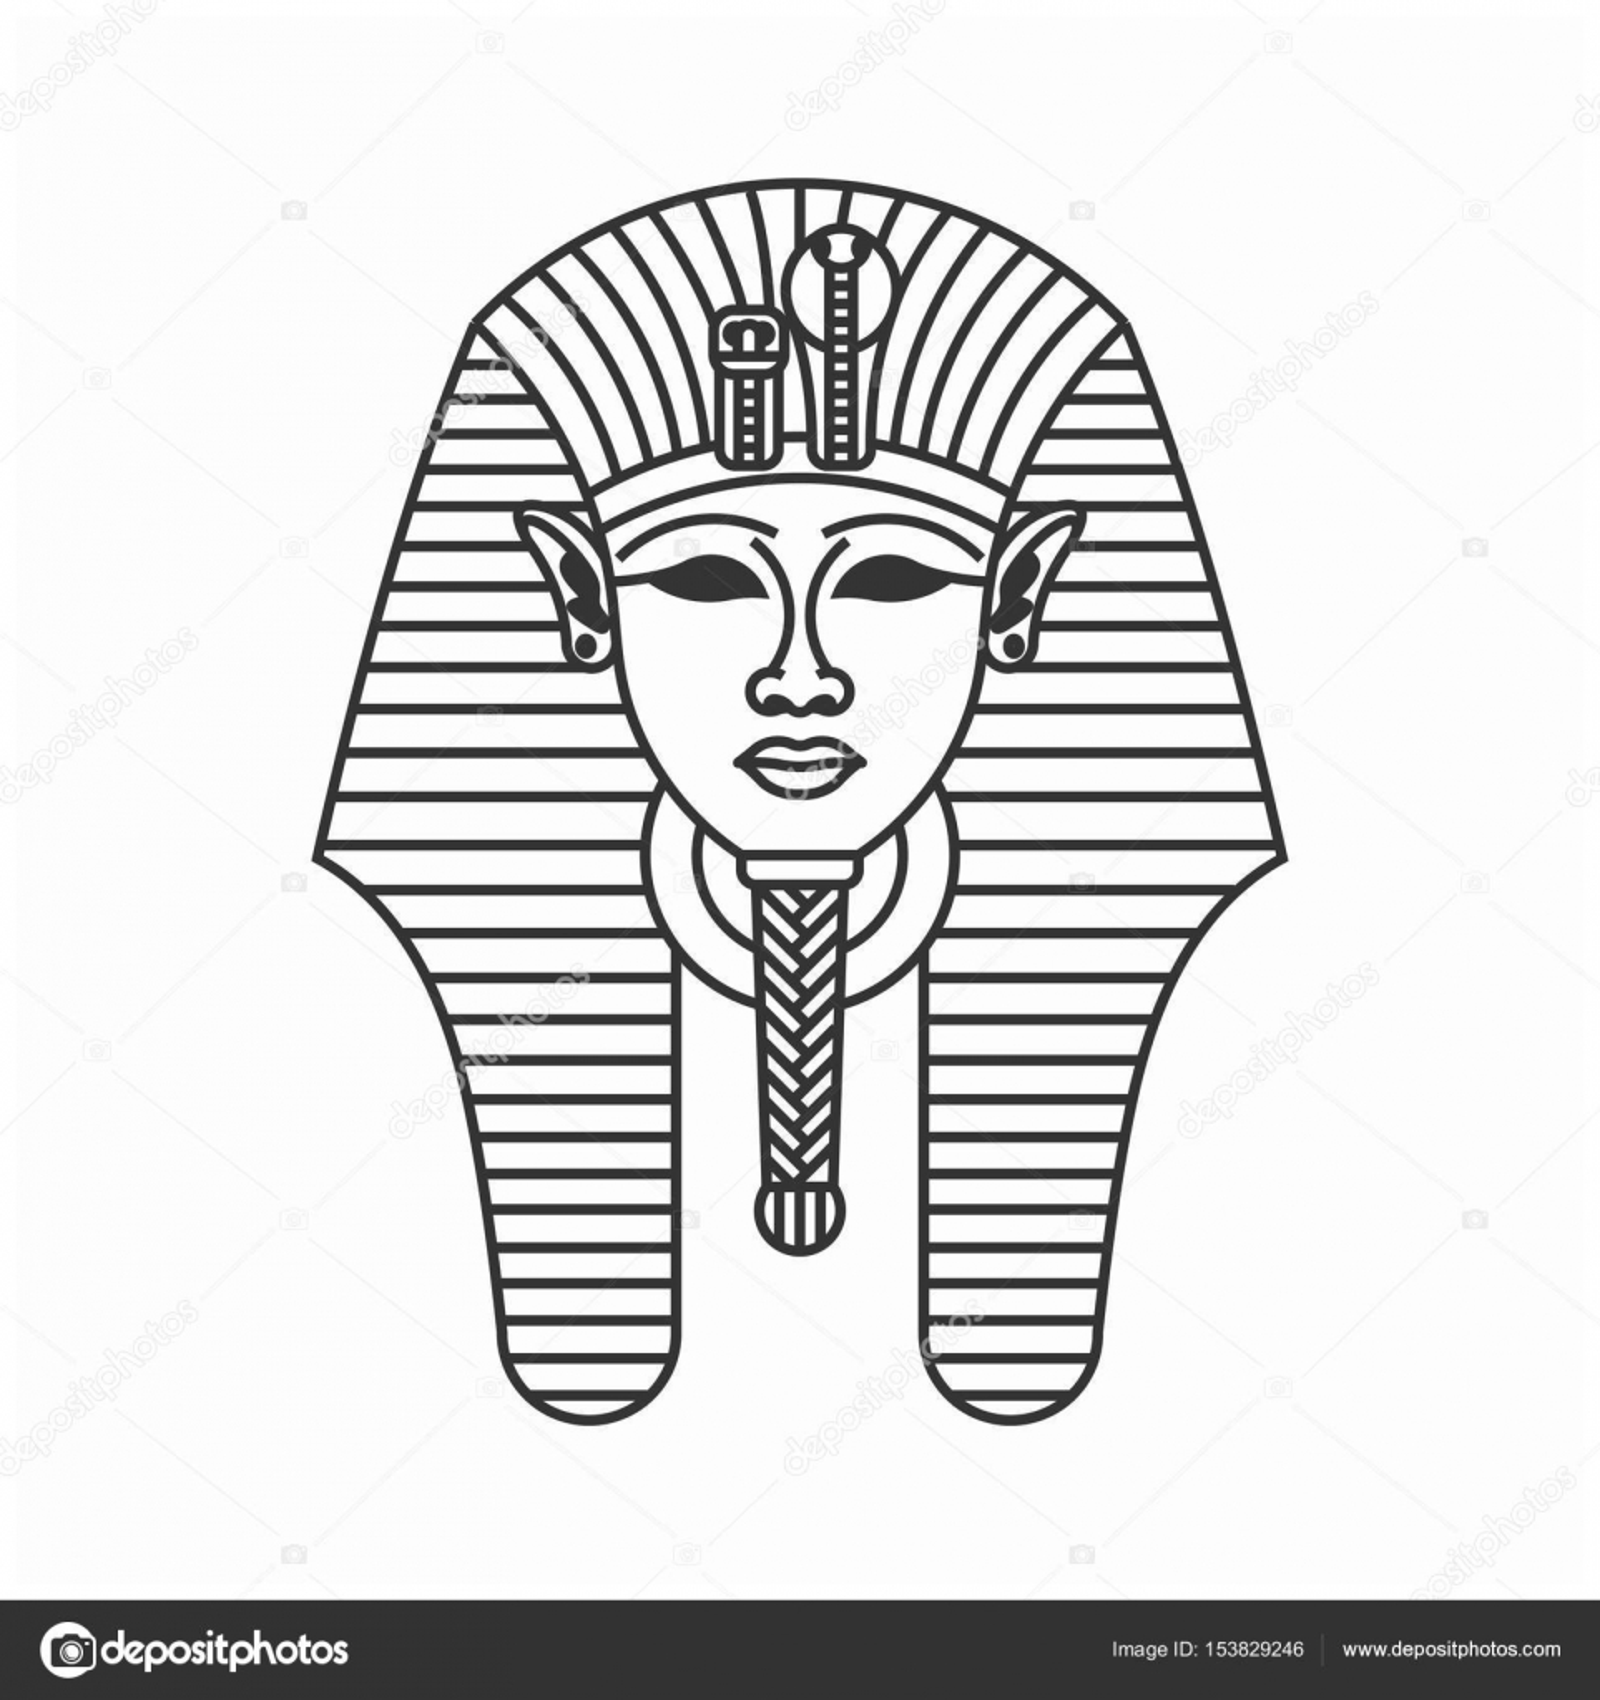 Tutankhamun burial mask icon — Stock Vector © smolyakov